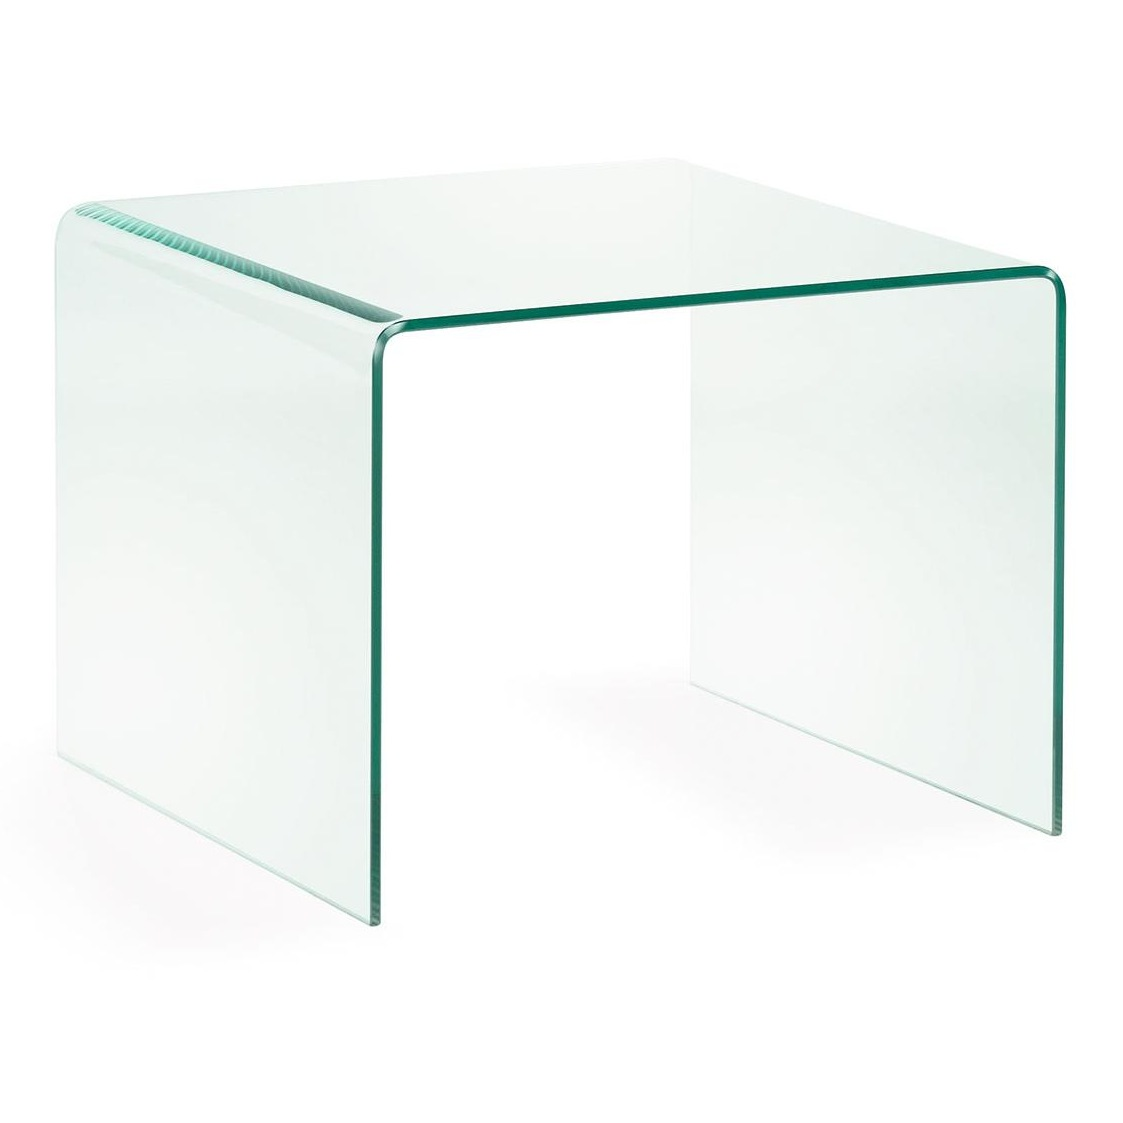 Столик burano (julia grup) прозрачный 60x45x60 см.